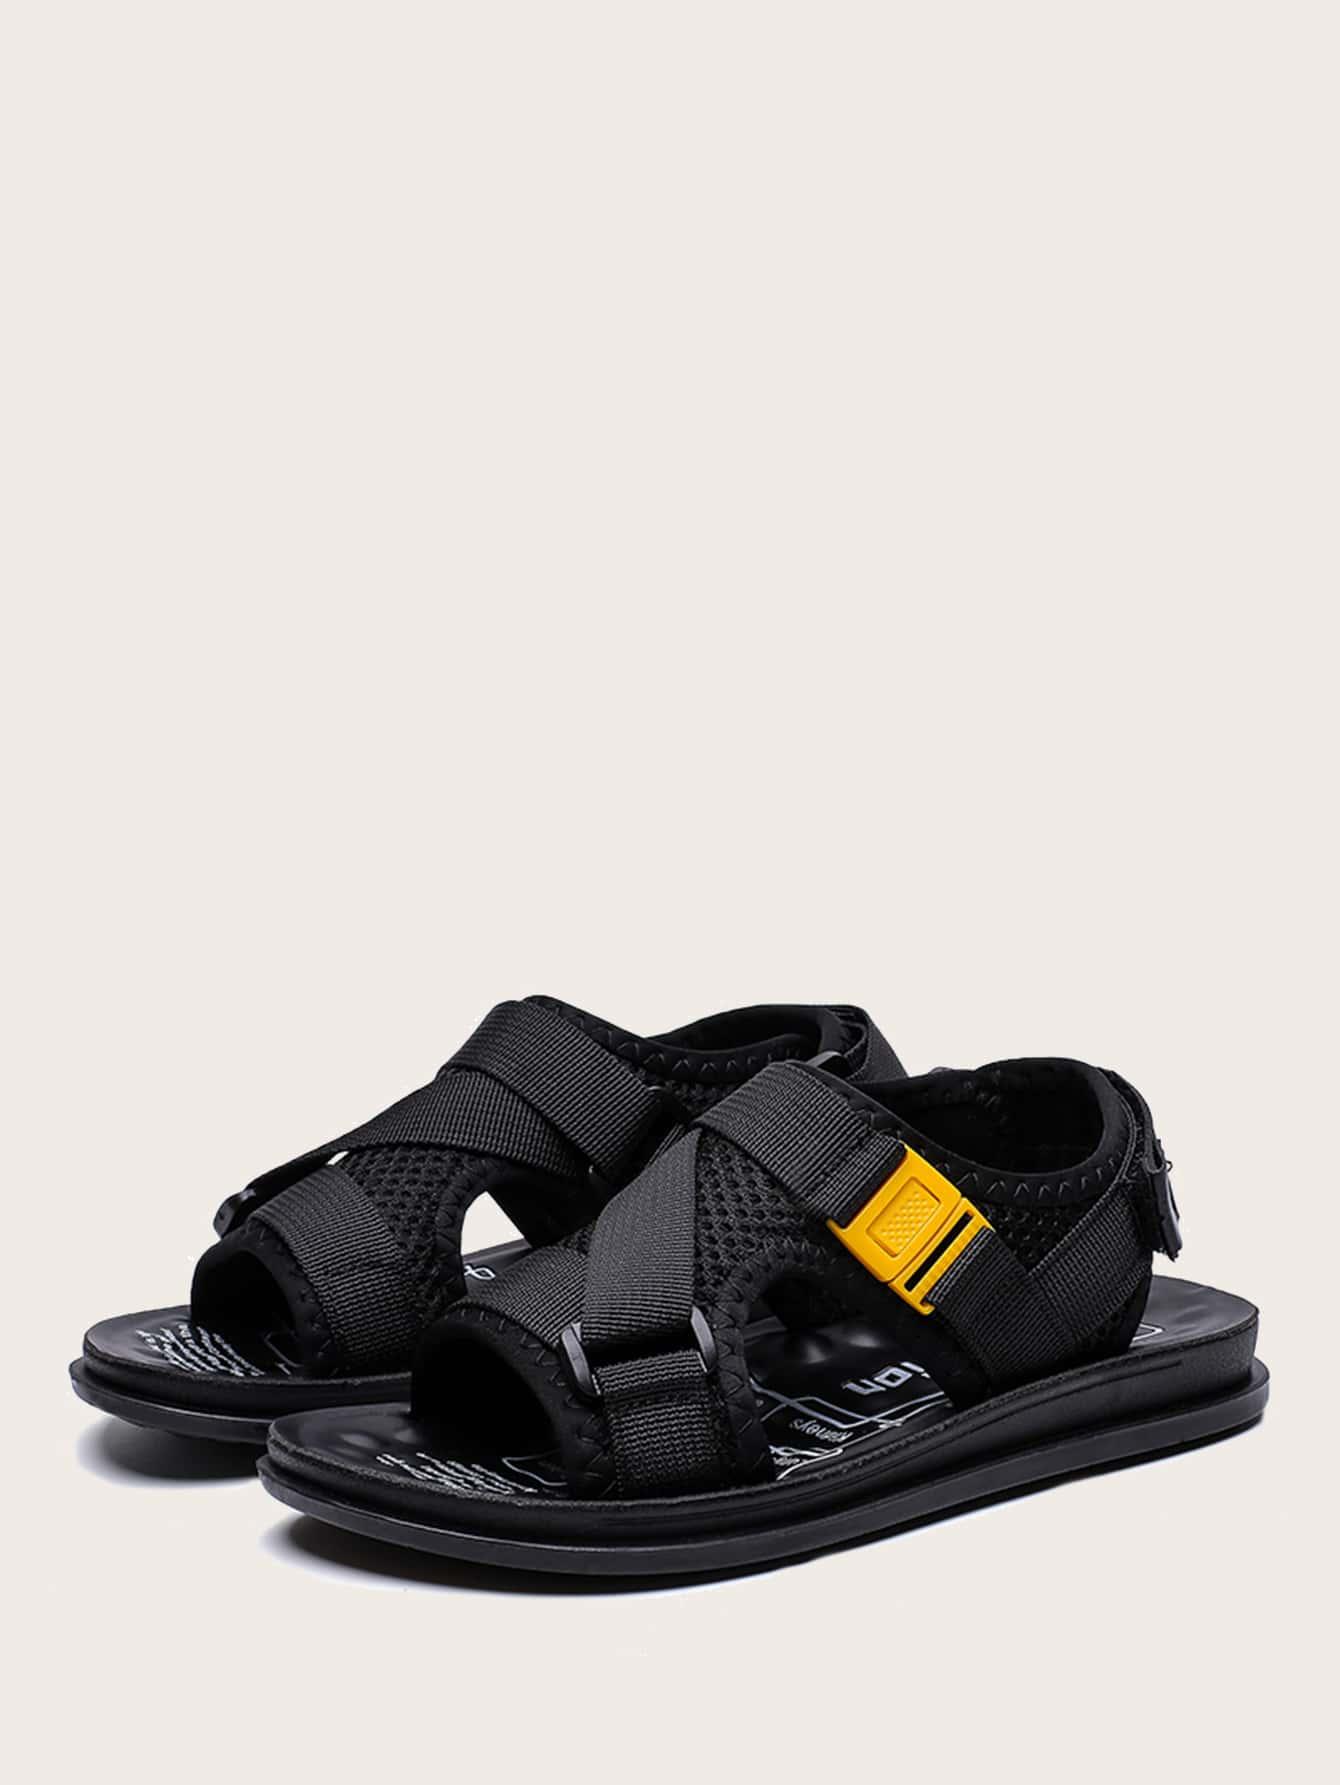 Boys Velcro Strap Design Sandals